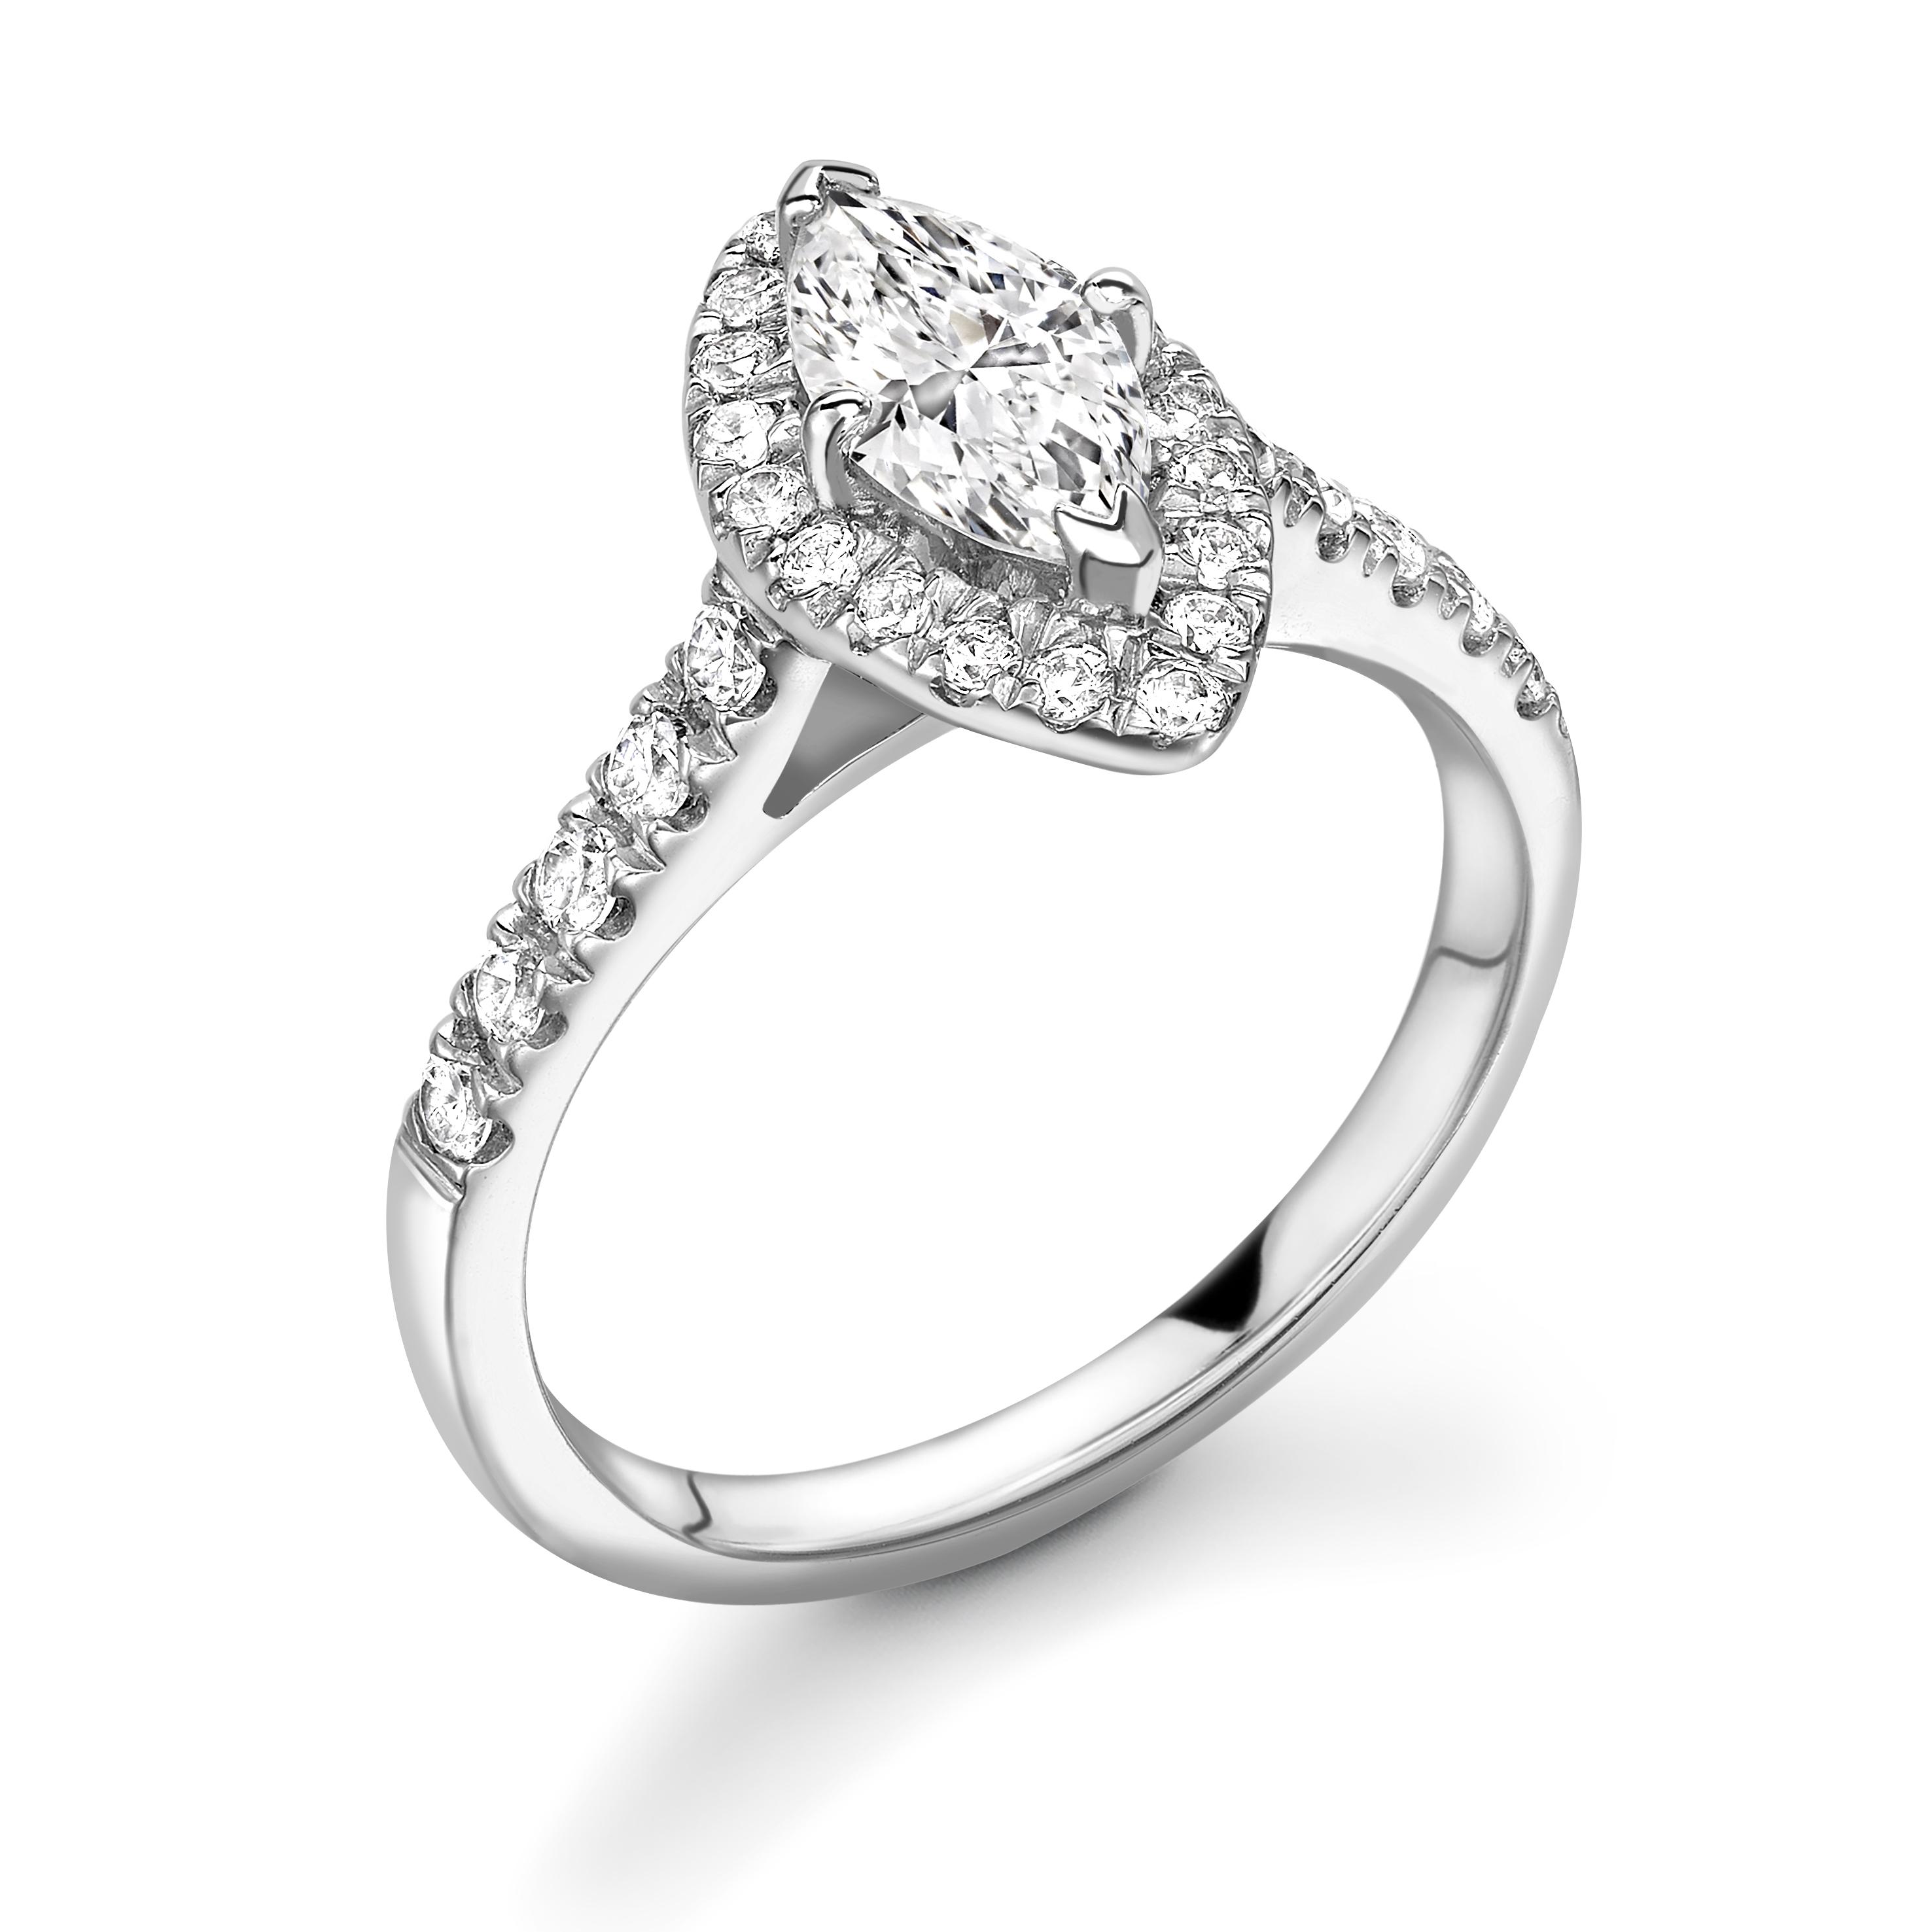 4 Prong Setting Marquise Shape Circle of Diamond Halo Diamond Engagement Rings